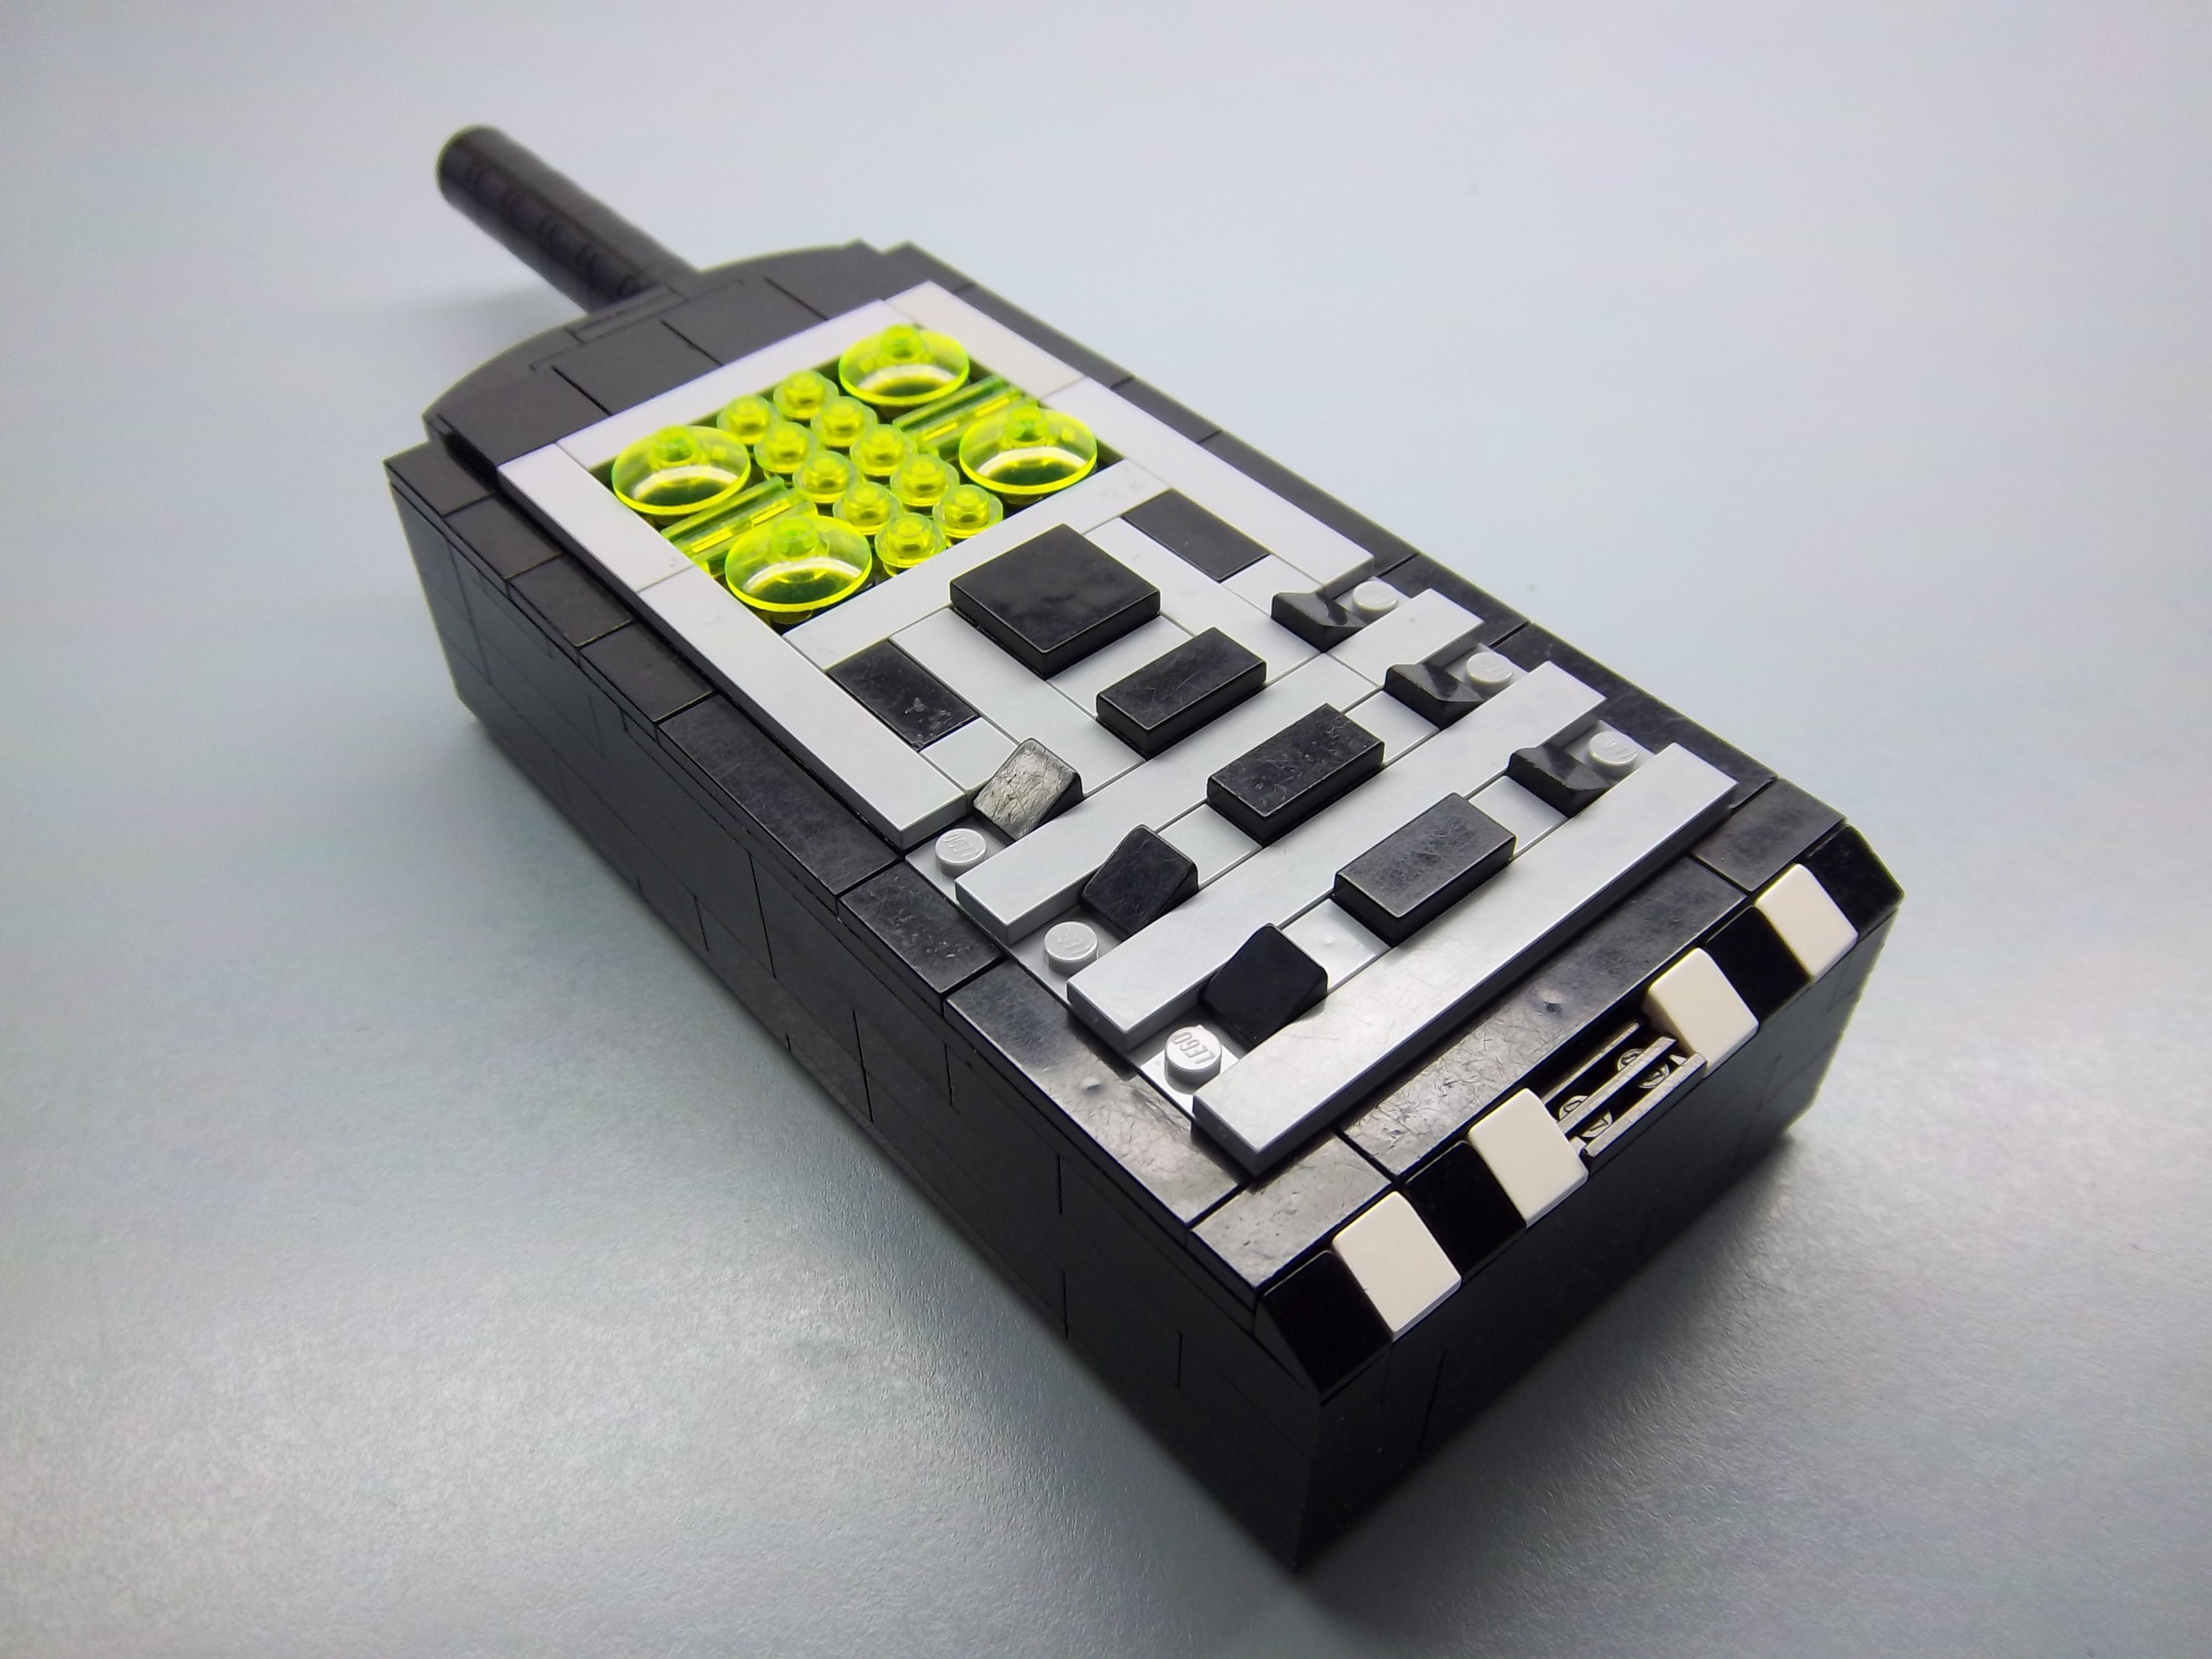 LEGO mw3 UAV radio